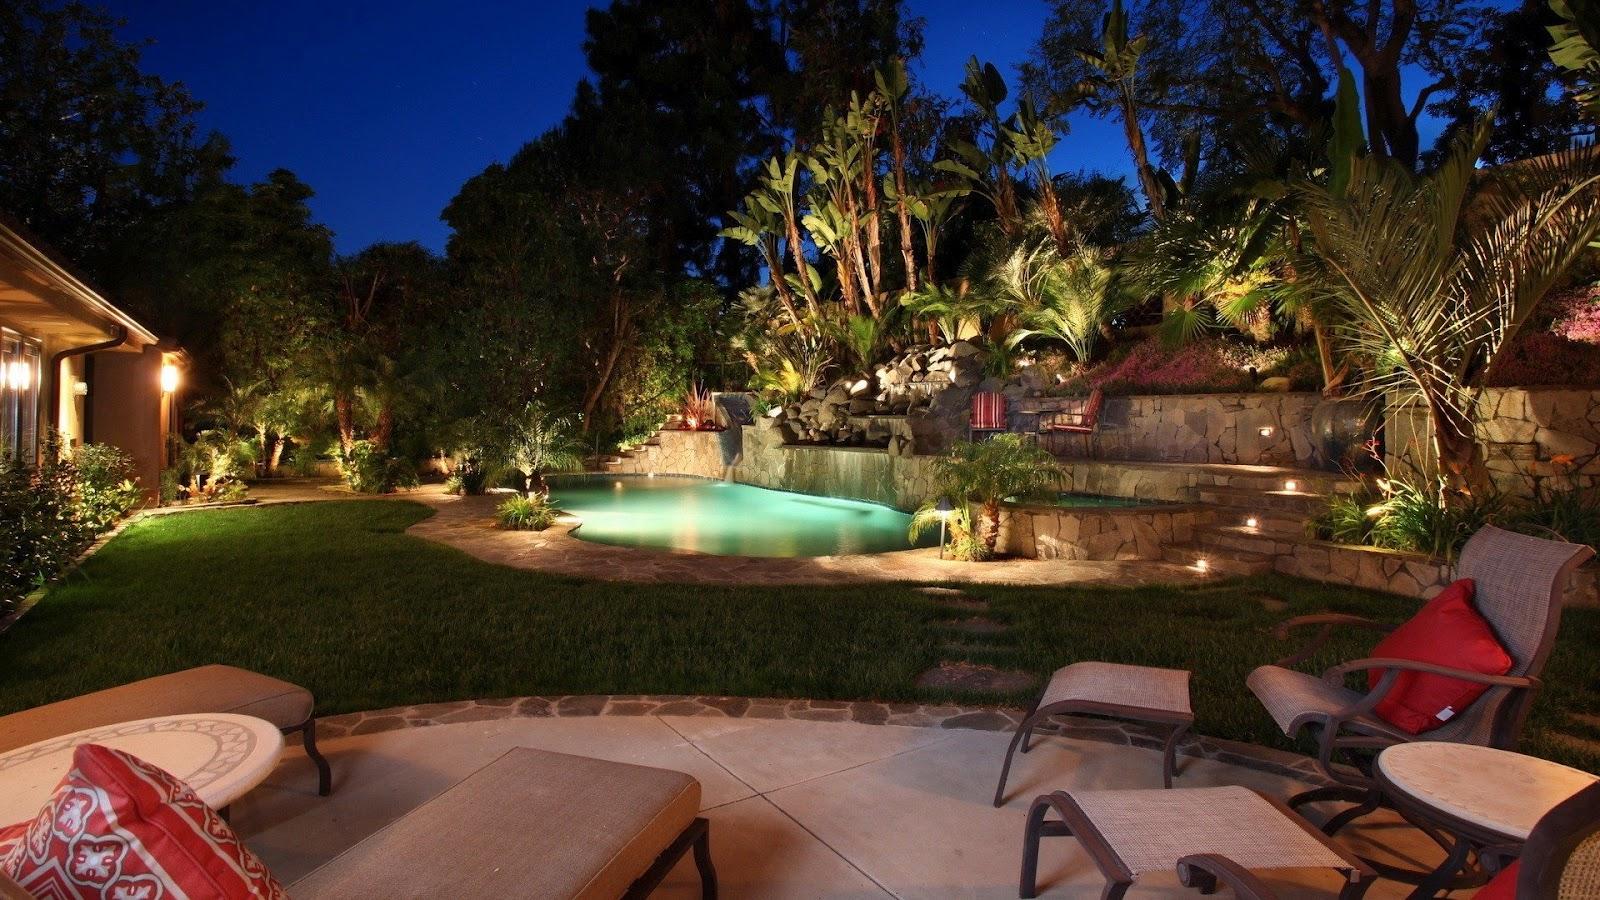 Backyard Background Images : Luxury Computer Wallpaper Free download luxury backyard